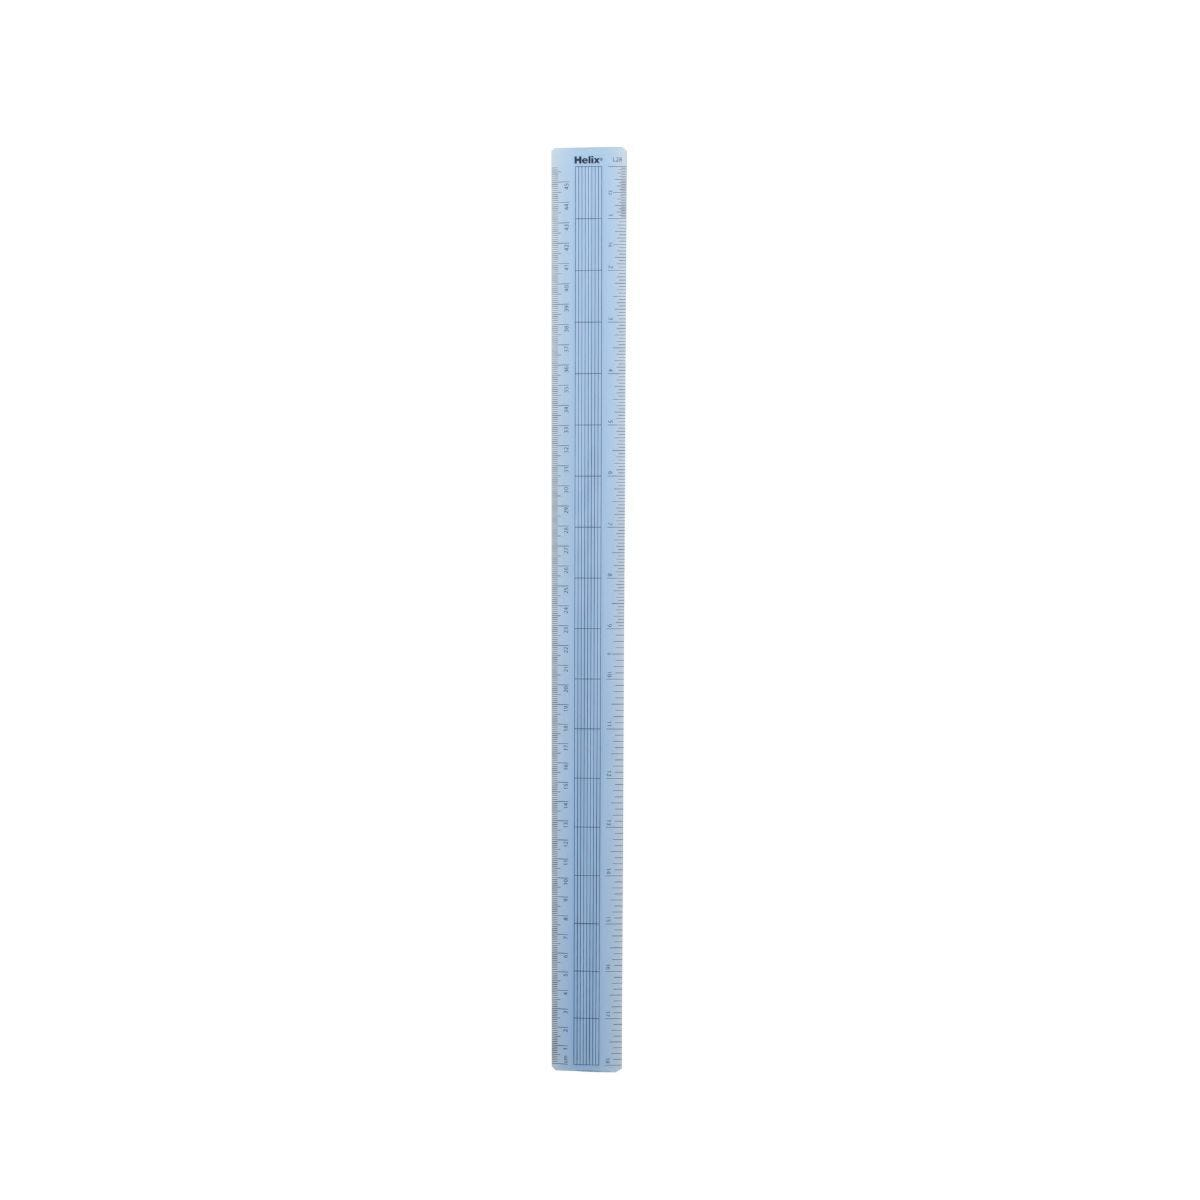 Helix Office Ruler 45cm